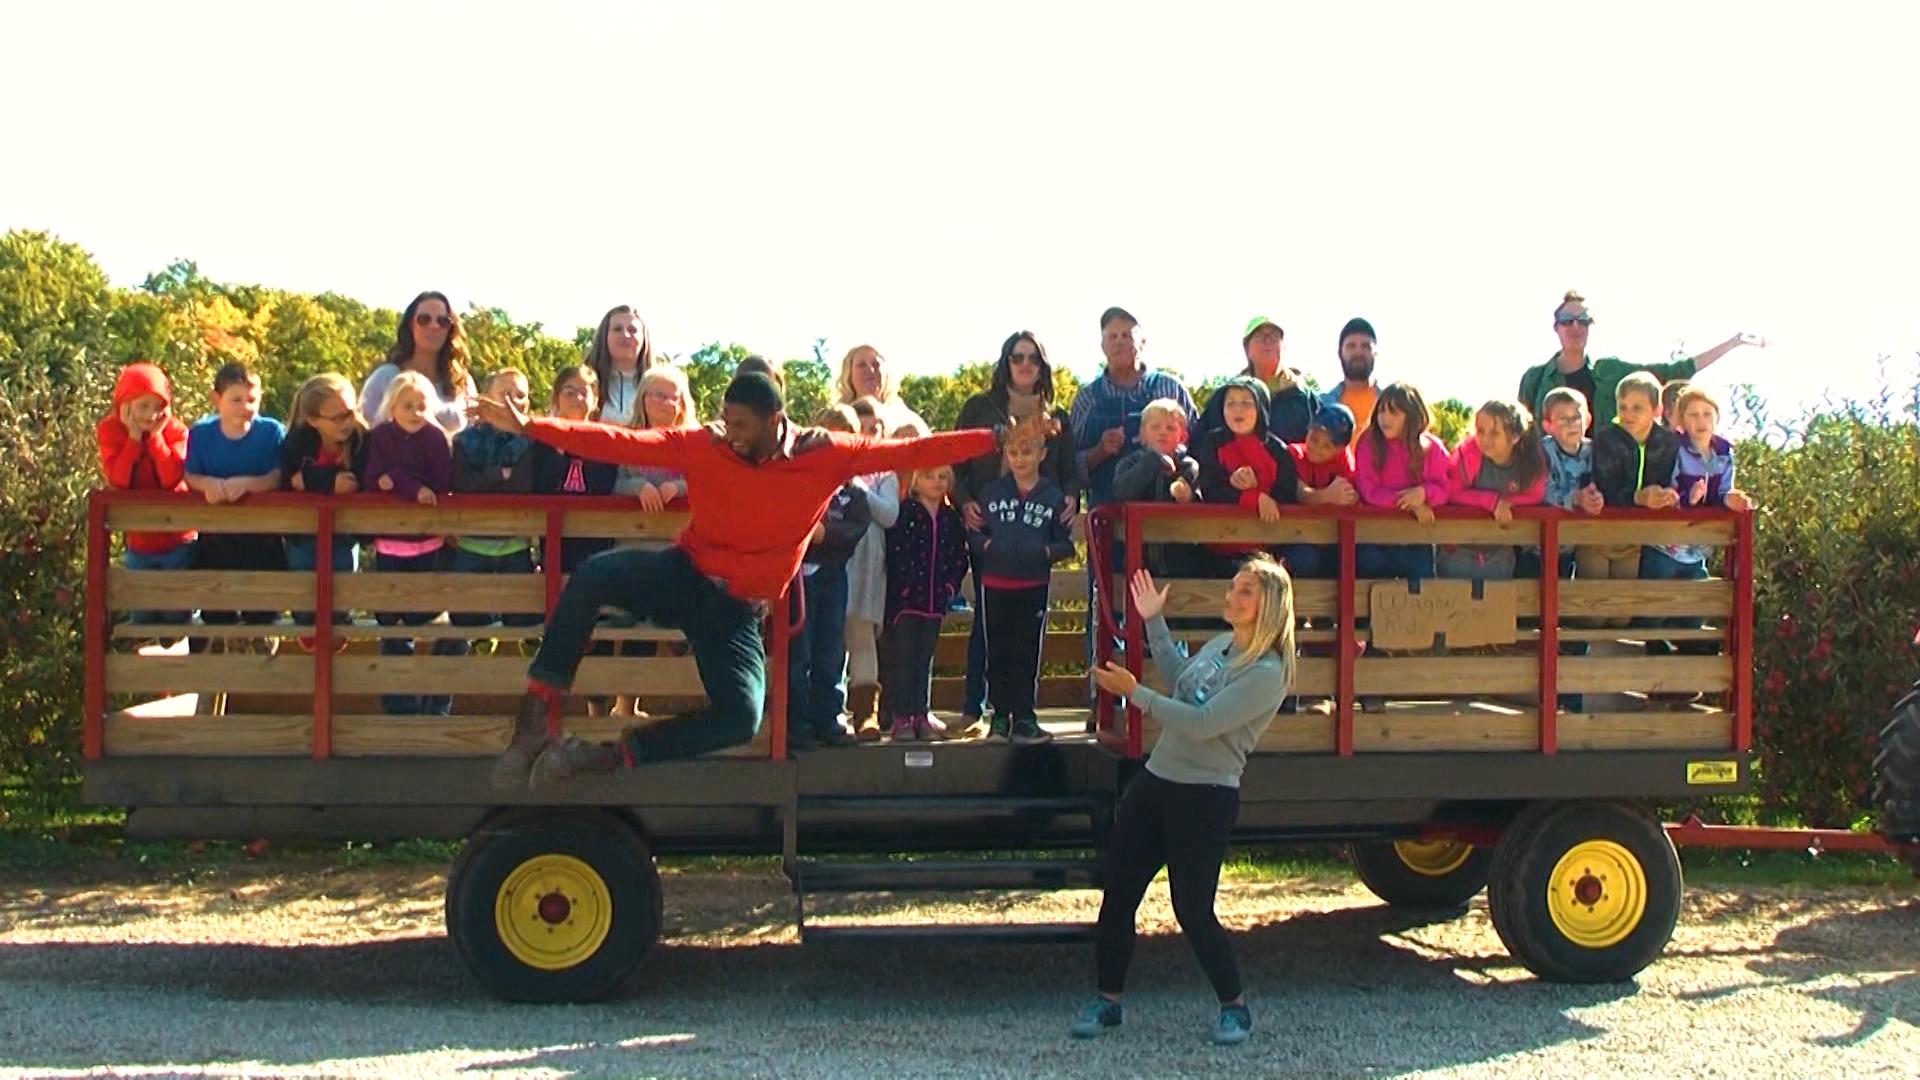 The Taste Of Fall At Knaebe S Apple Farm Field Trip Friday Wbkb 11